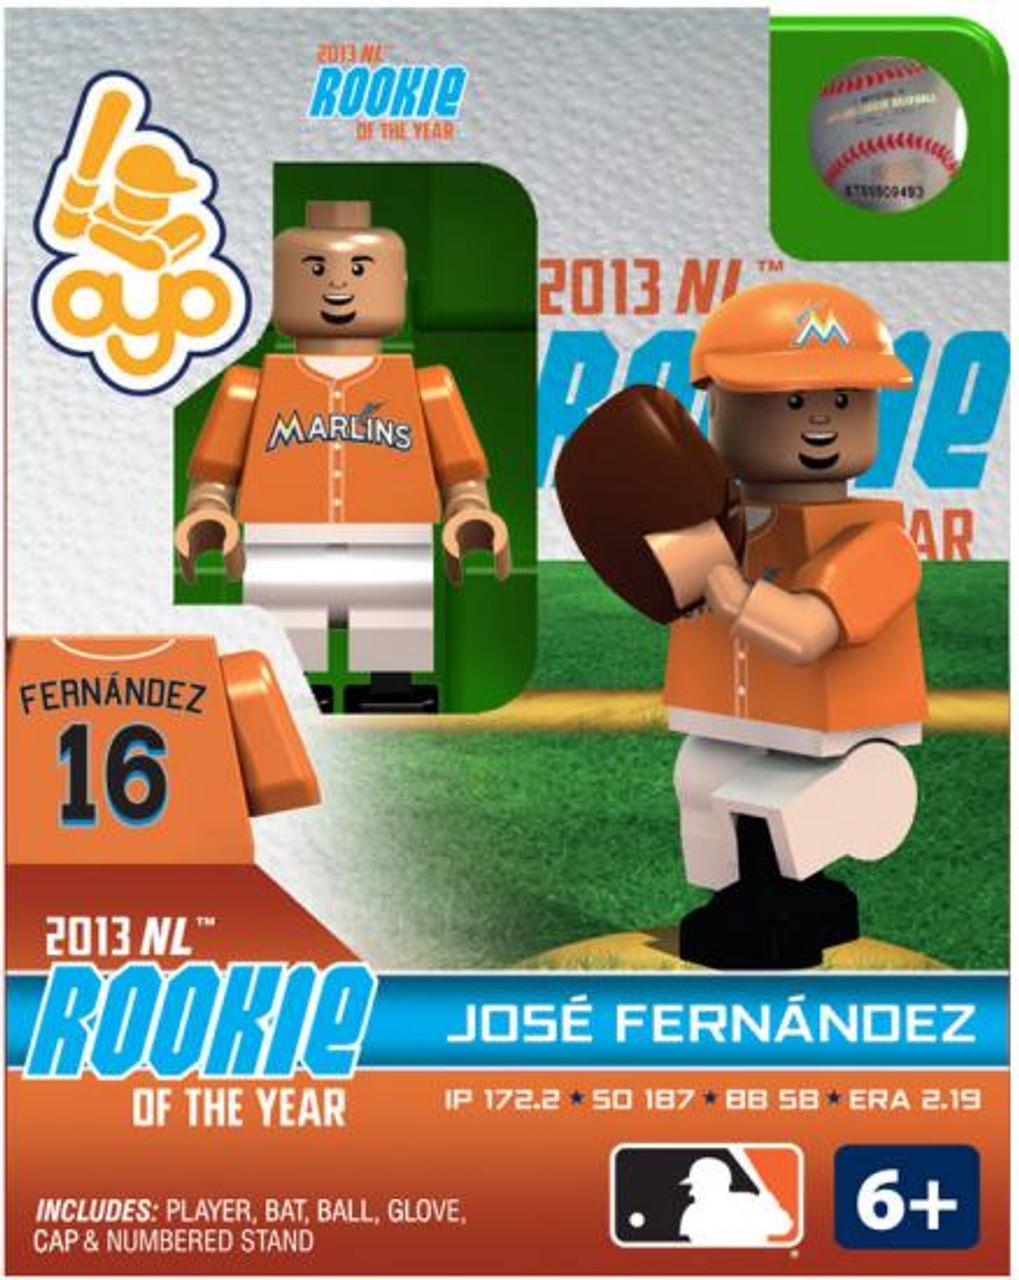 Miami Marlins MLB 2013 NL Rookie of the Year Jose Fernandez Minifigure